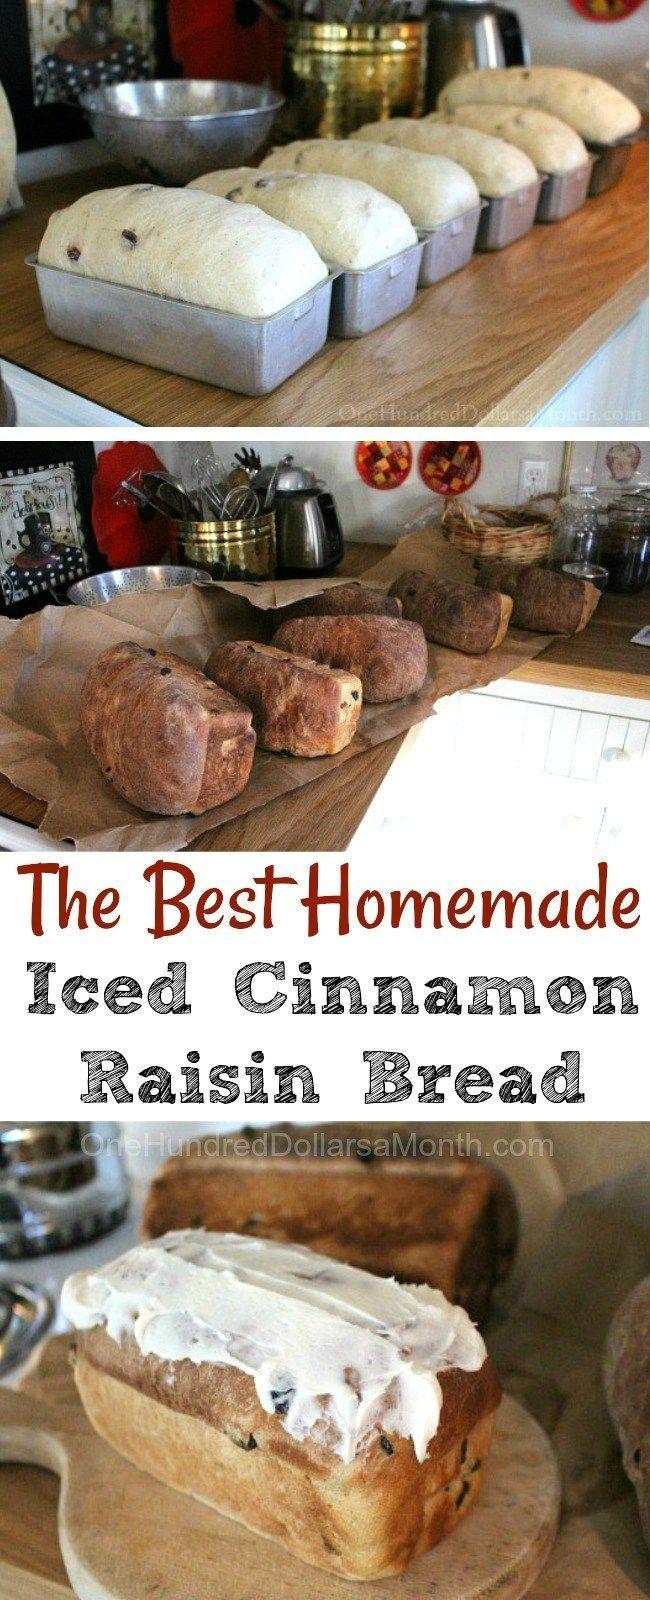 Iced Cinnamon Raisin Bread, Bread Recipes, Iced Cinnamon Raisin Bread, Raisin Bread Recipes